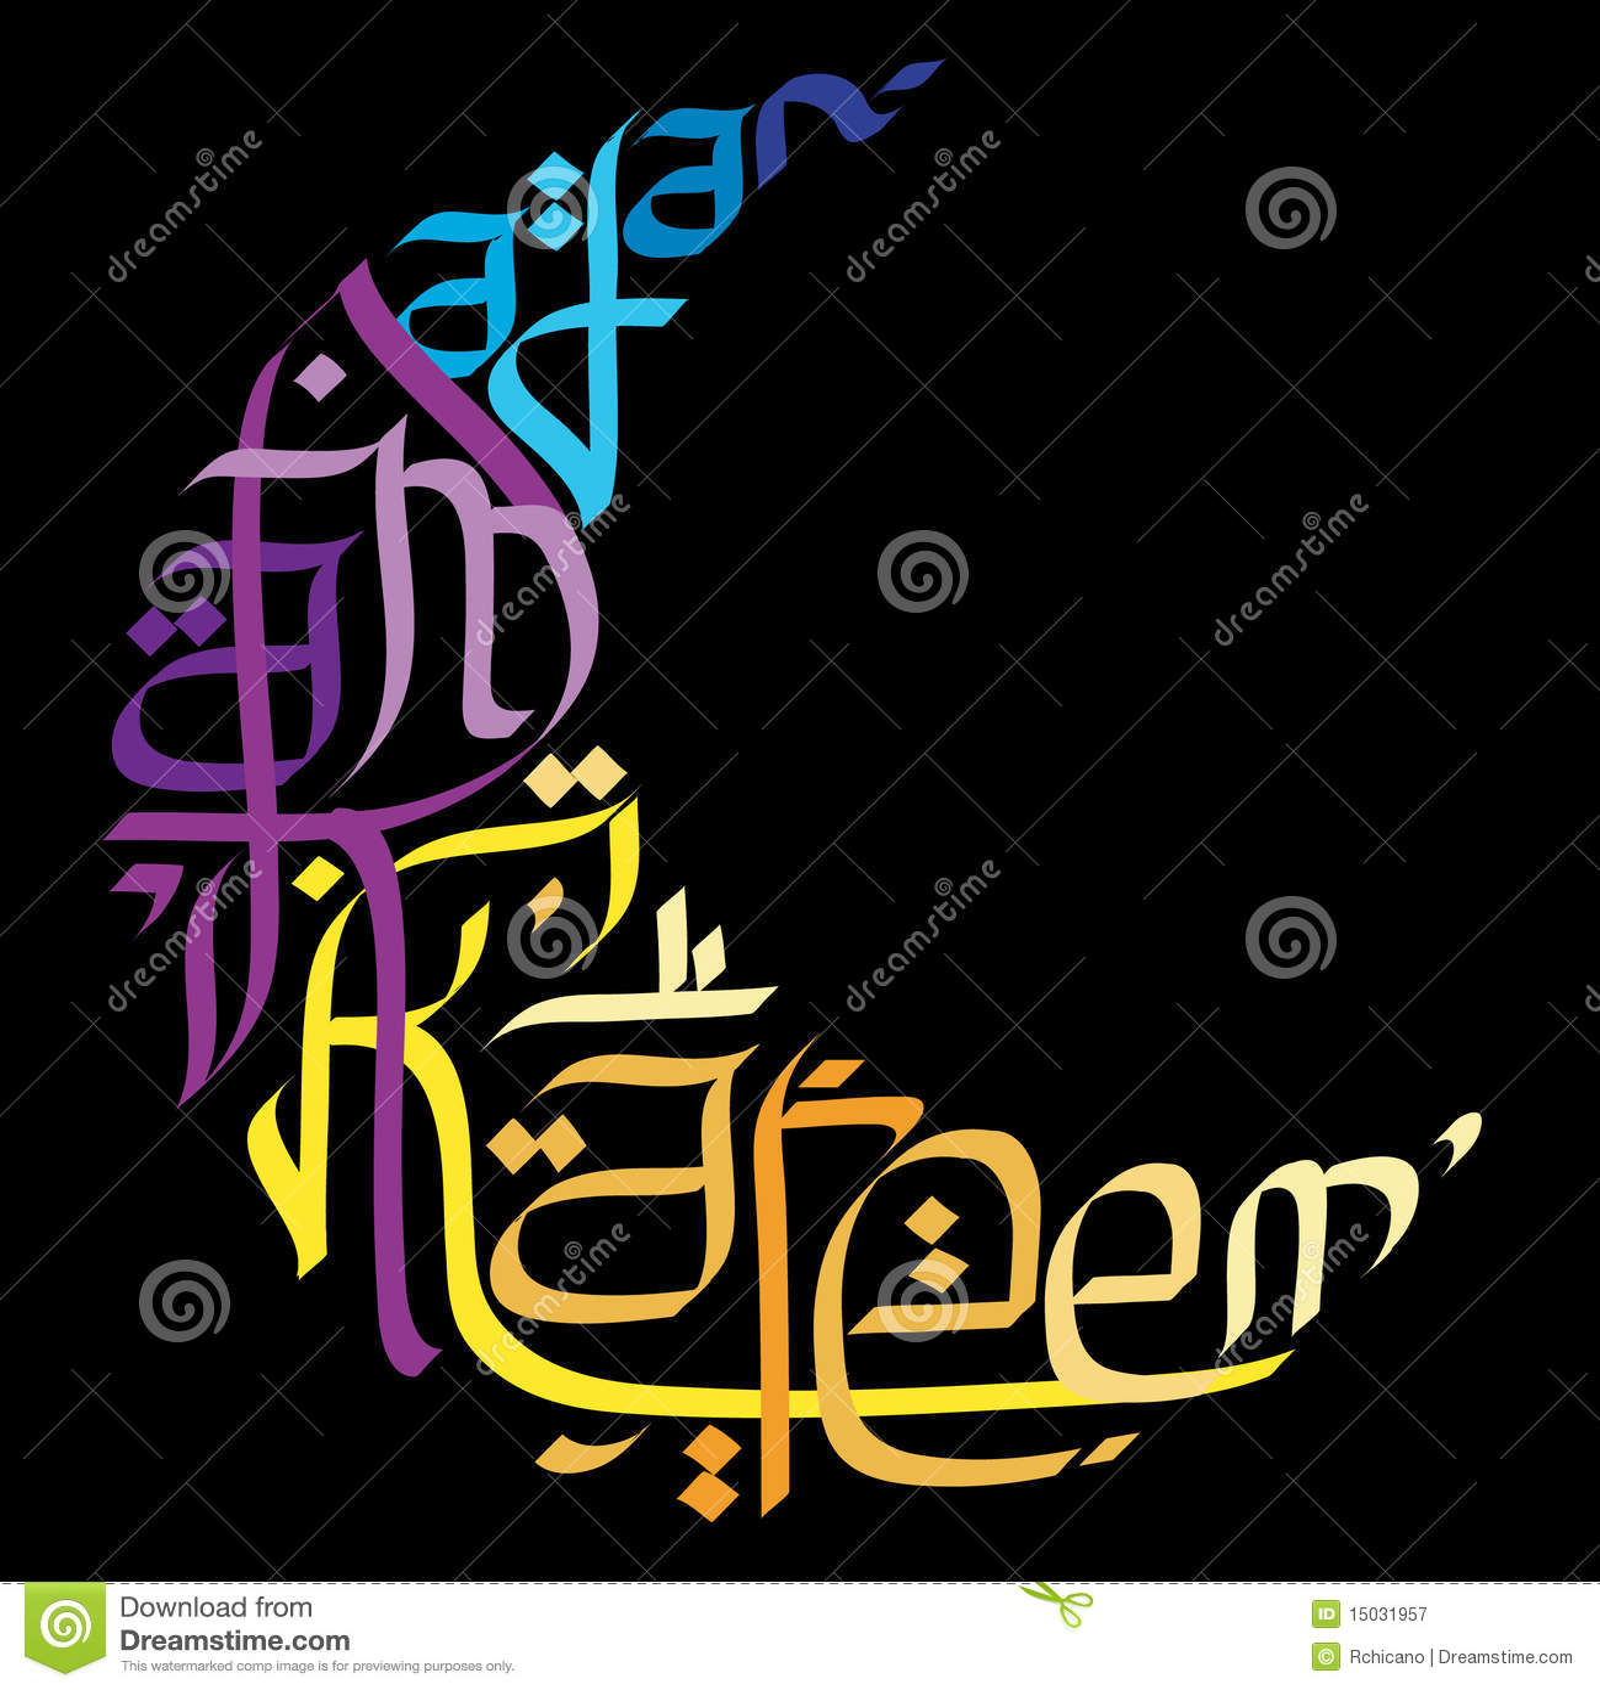 Ramadan greetings in english calligraphy stock vector illustration ramadan greetings in english calligraphy kristyandbryce Images